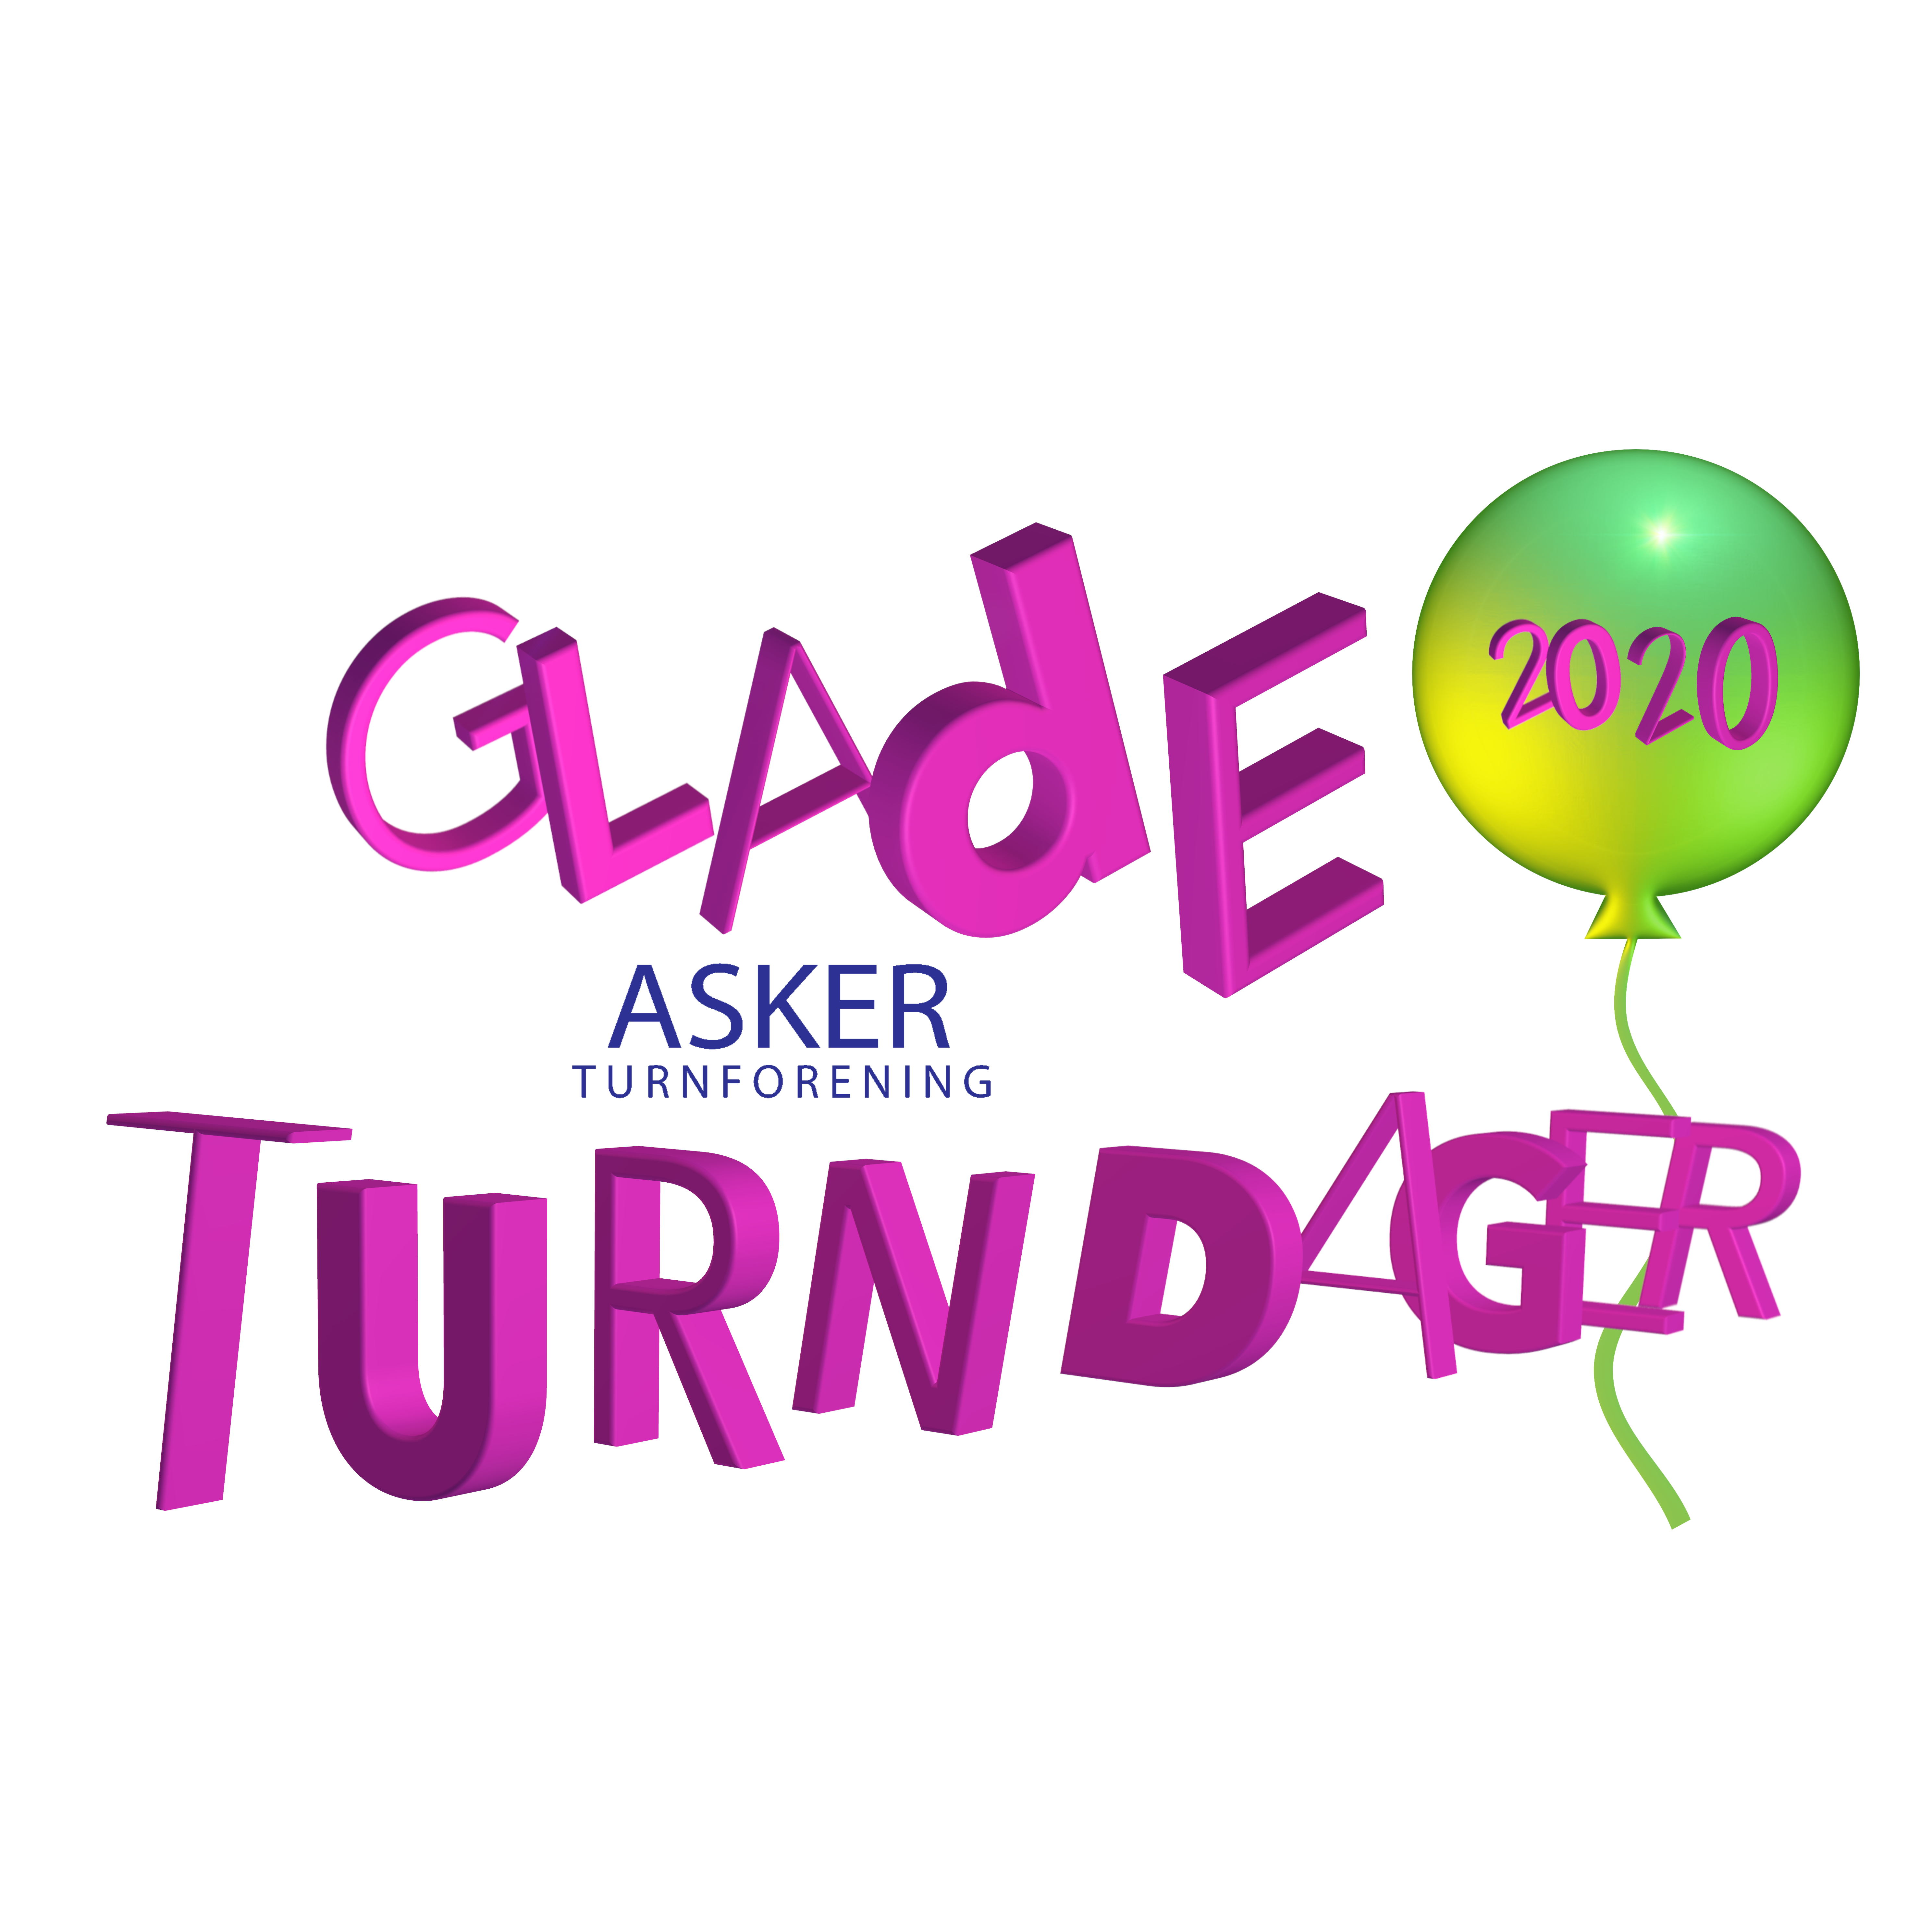 Logo%20Glade%20Turndager%20NY%202020%20vers.%209.jpg